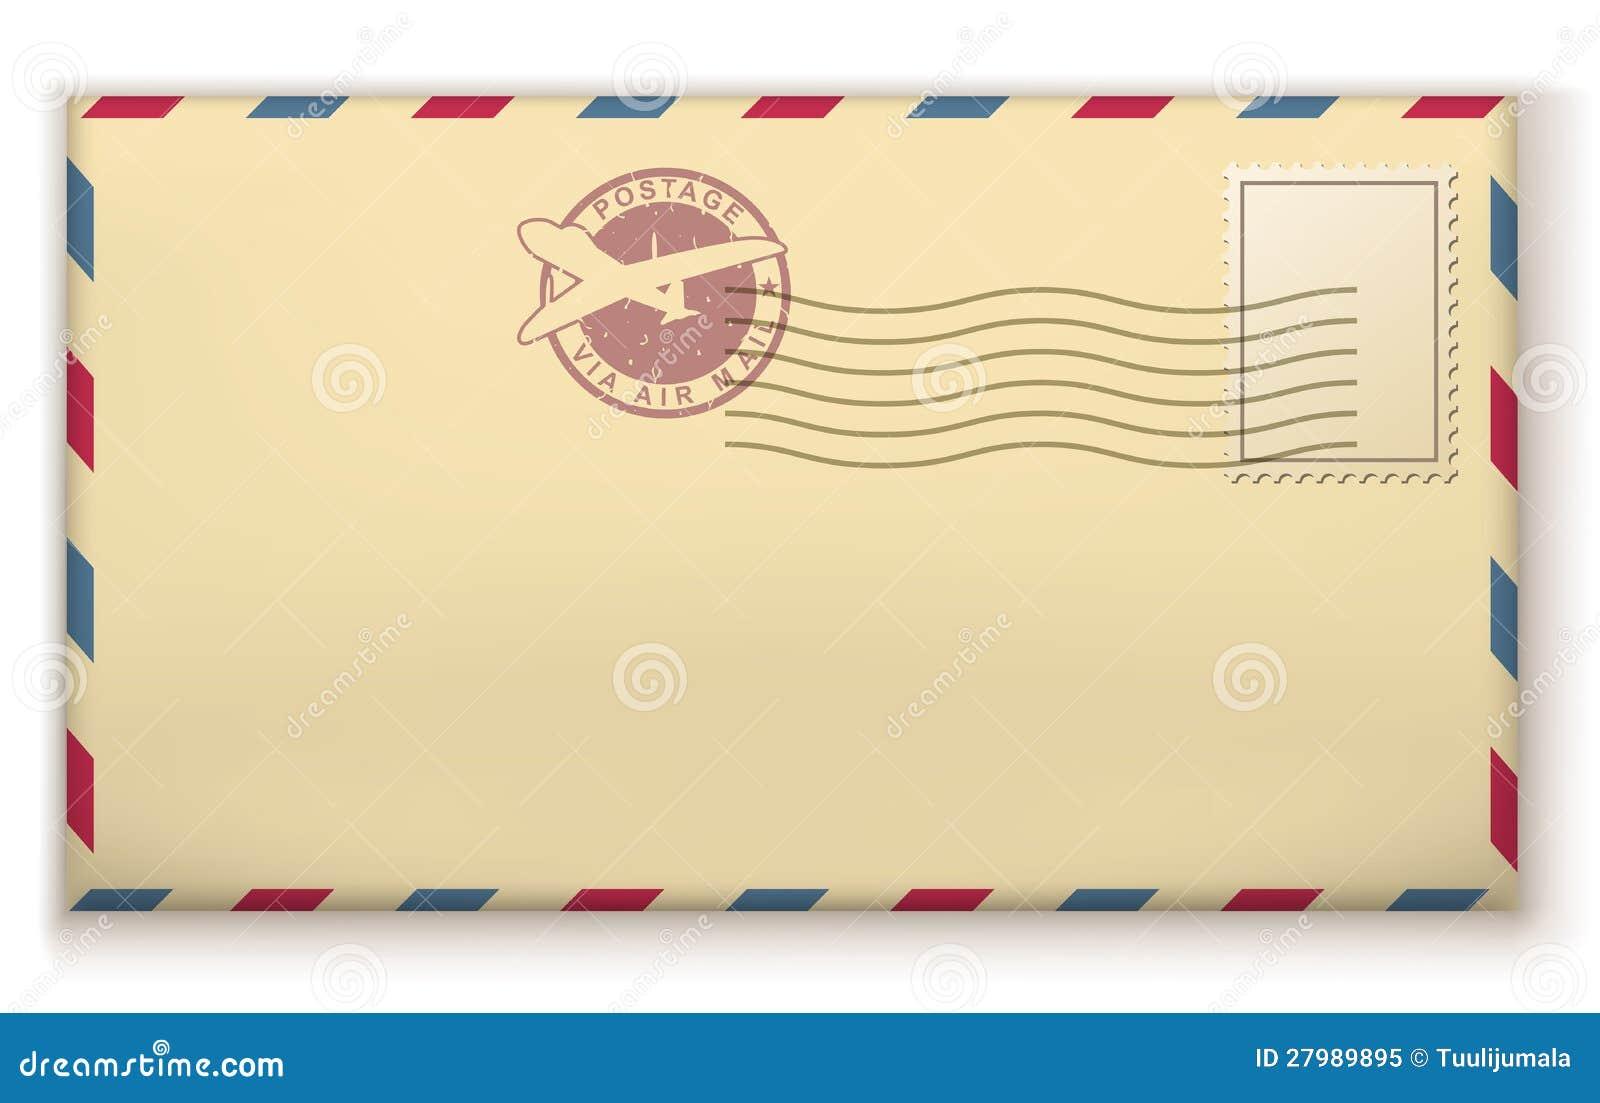 Old Postage Envelope Royalty Free Stock Photo - Image: 27989895